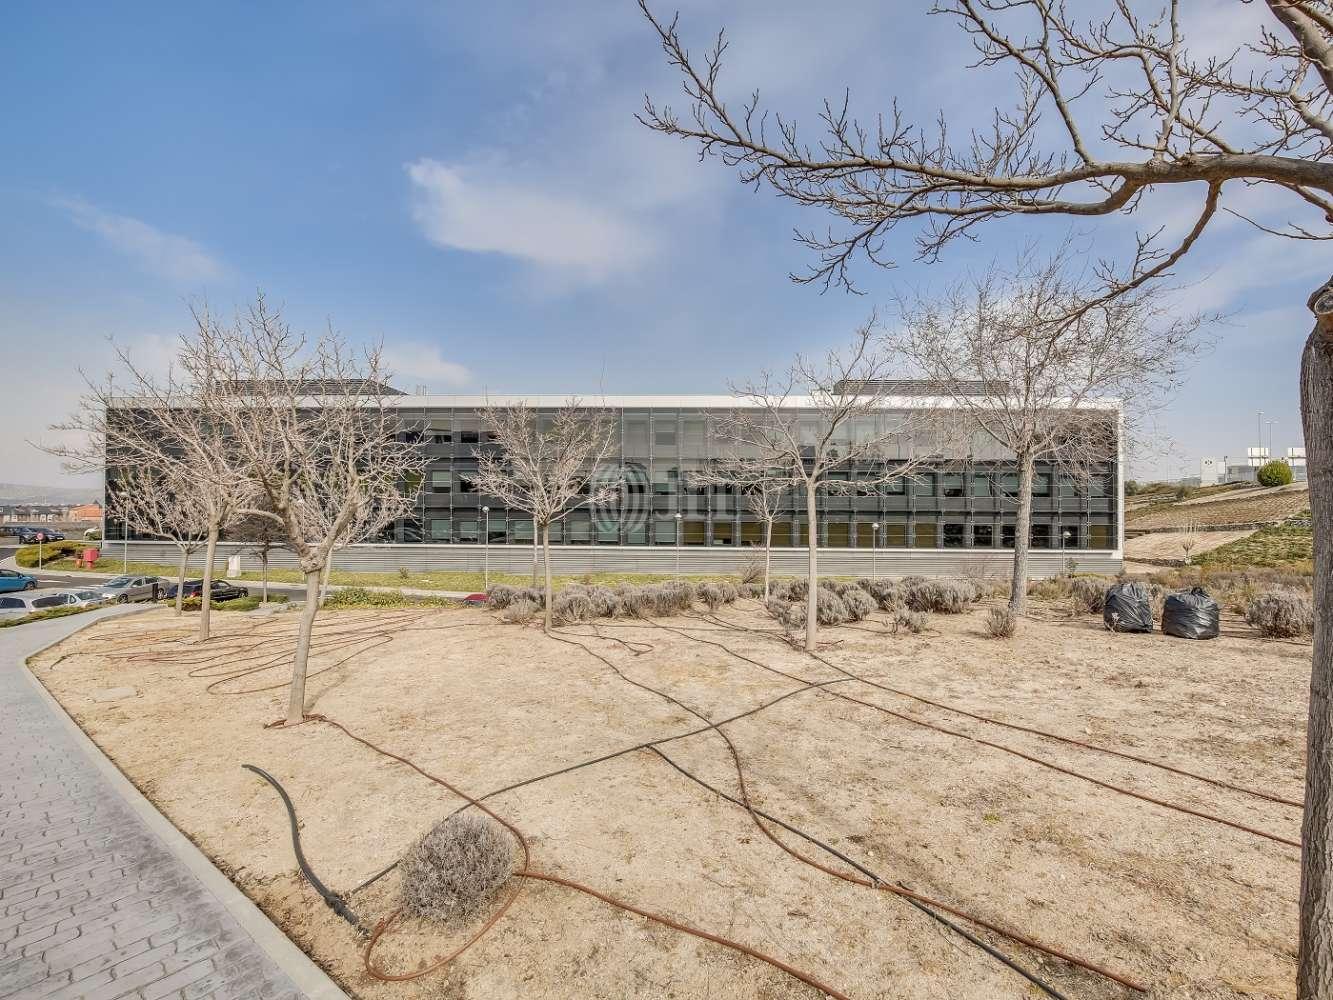 Oficina Las rozas de madrid, 28232 - Edificio 3. P.E. Alvia - 14364